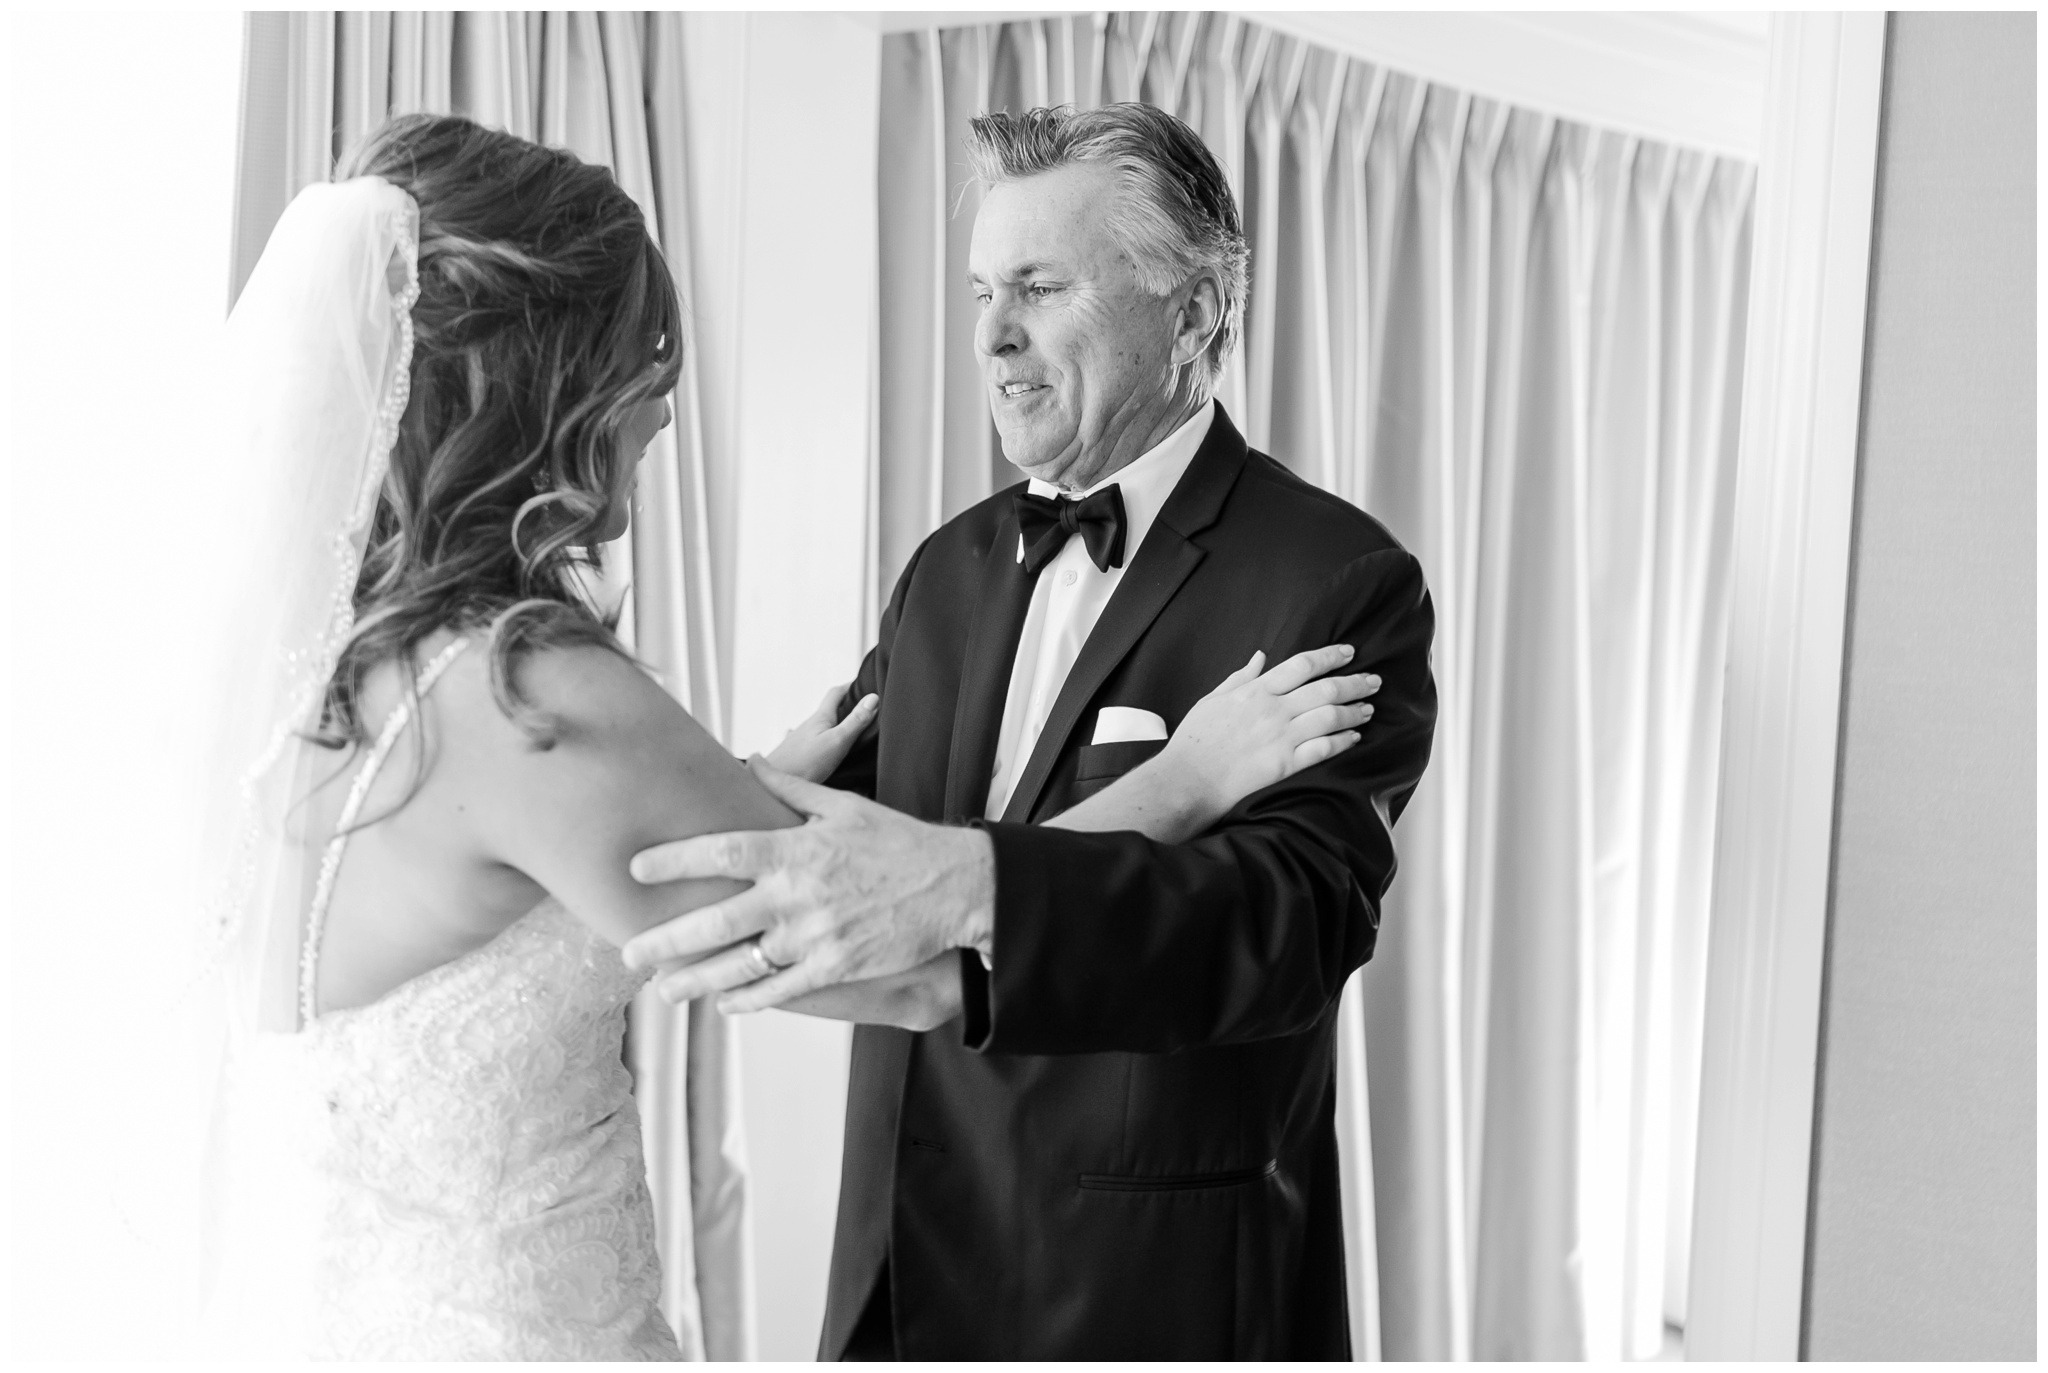 UW_Memorial_Union_wedding_madison_wisconsin_wedding_photographers_4587.jpg